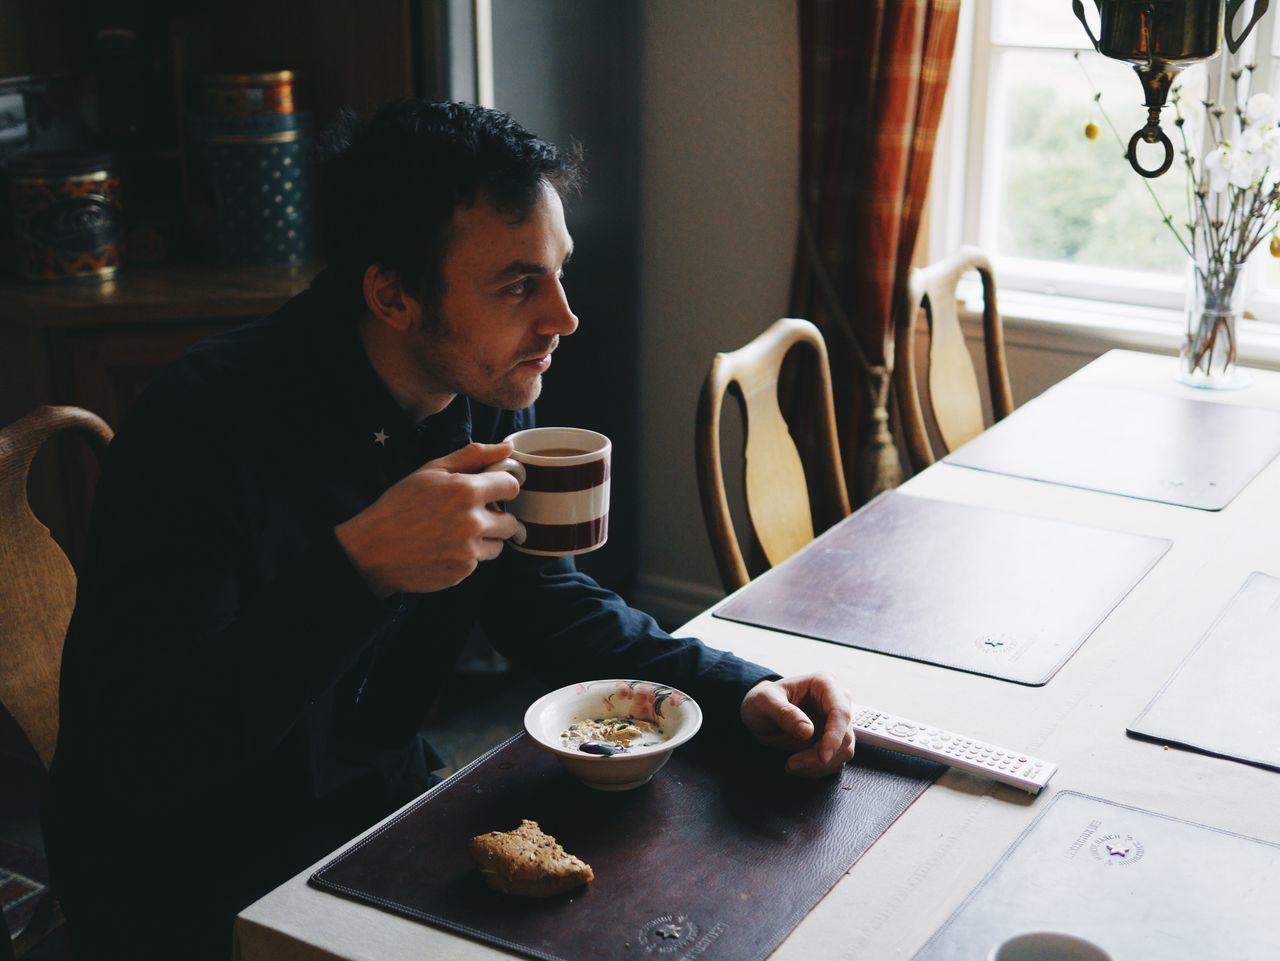 Brother at breakfast Breakfast Solvik Home Man